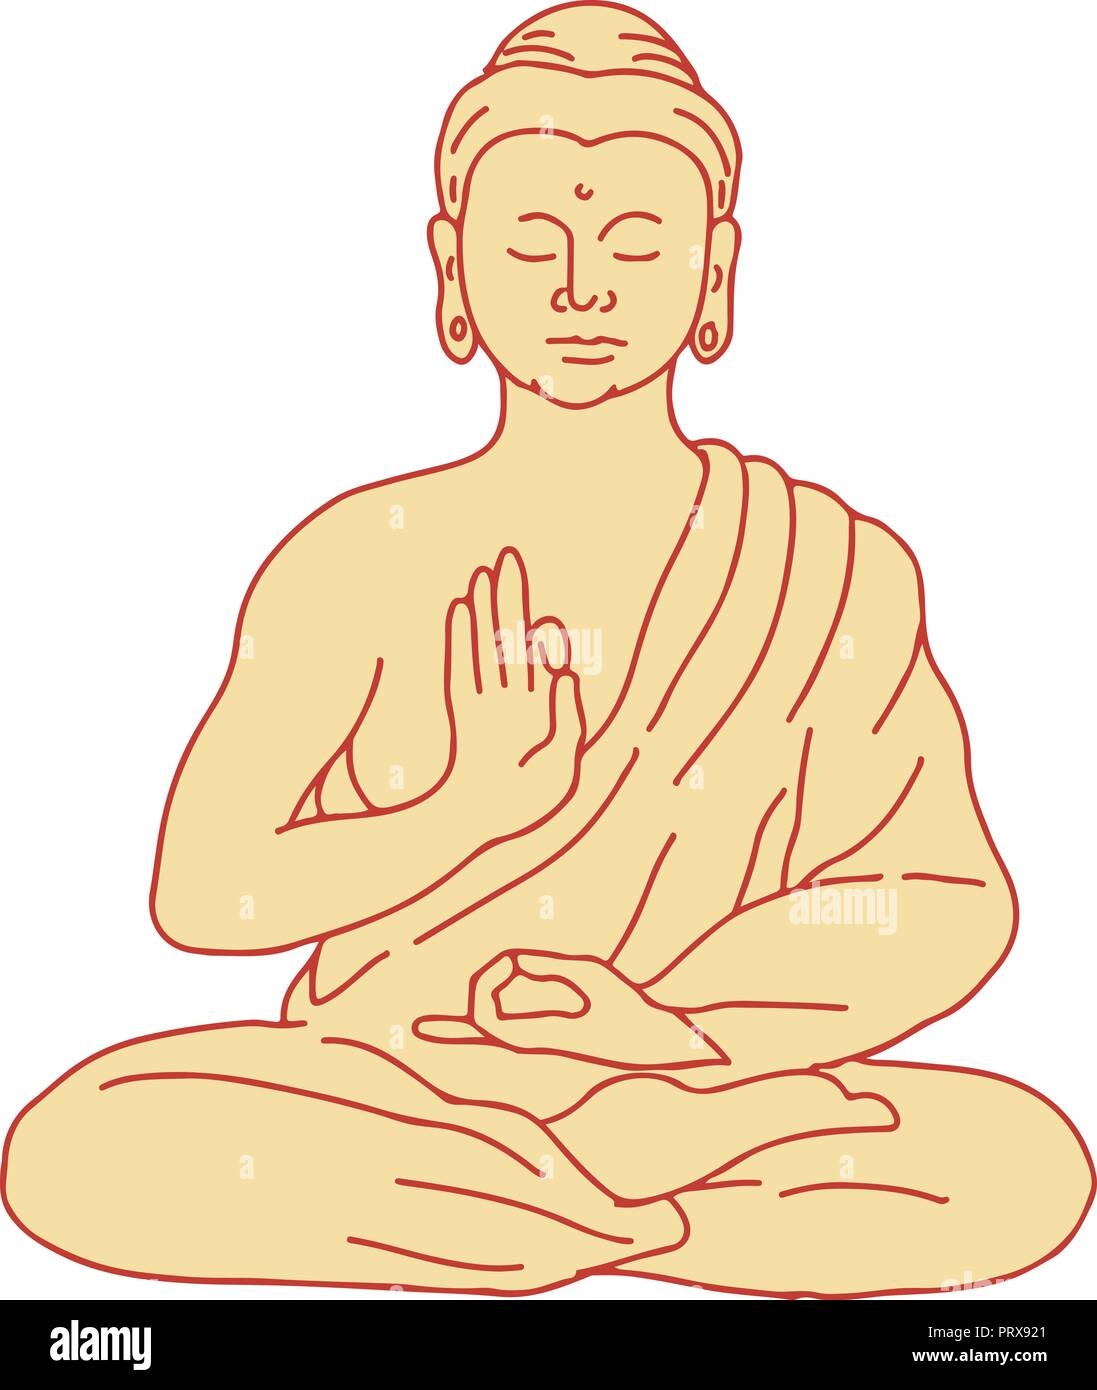 Drawing sketch style illustration of gautama buddha siddhartha gautama or shakyamuni buddha sitting in lotus position viewed from front on isolated b